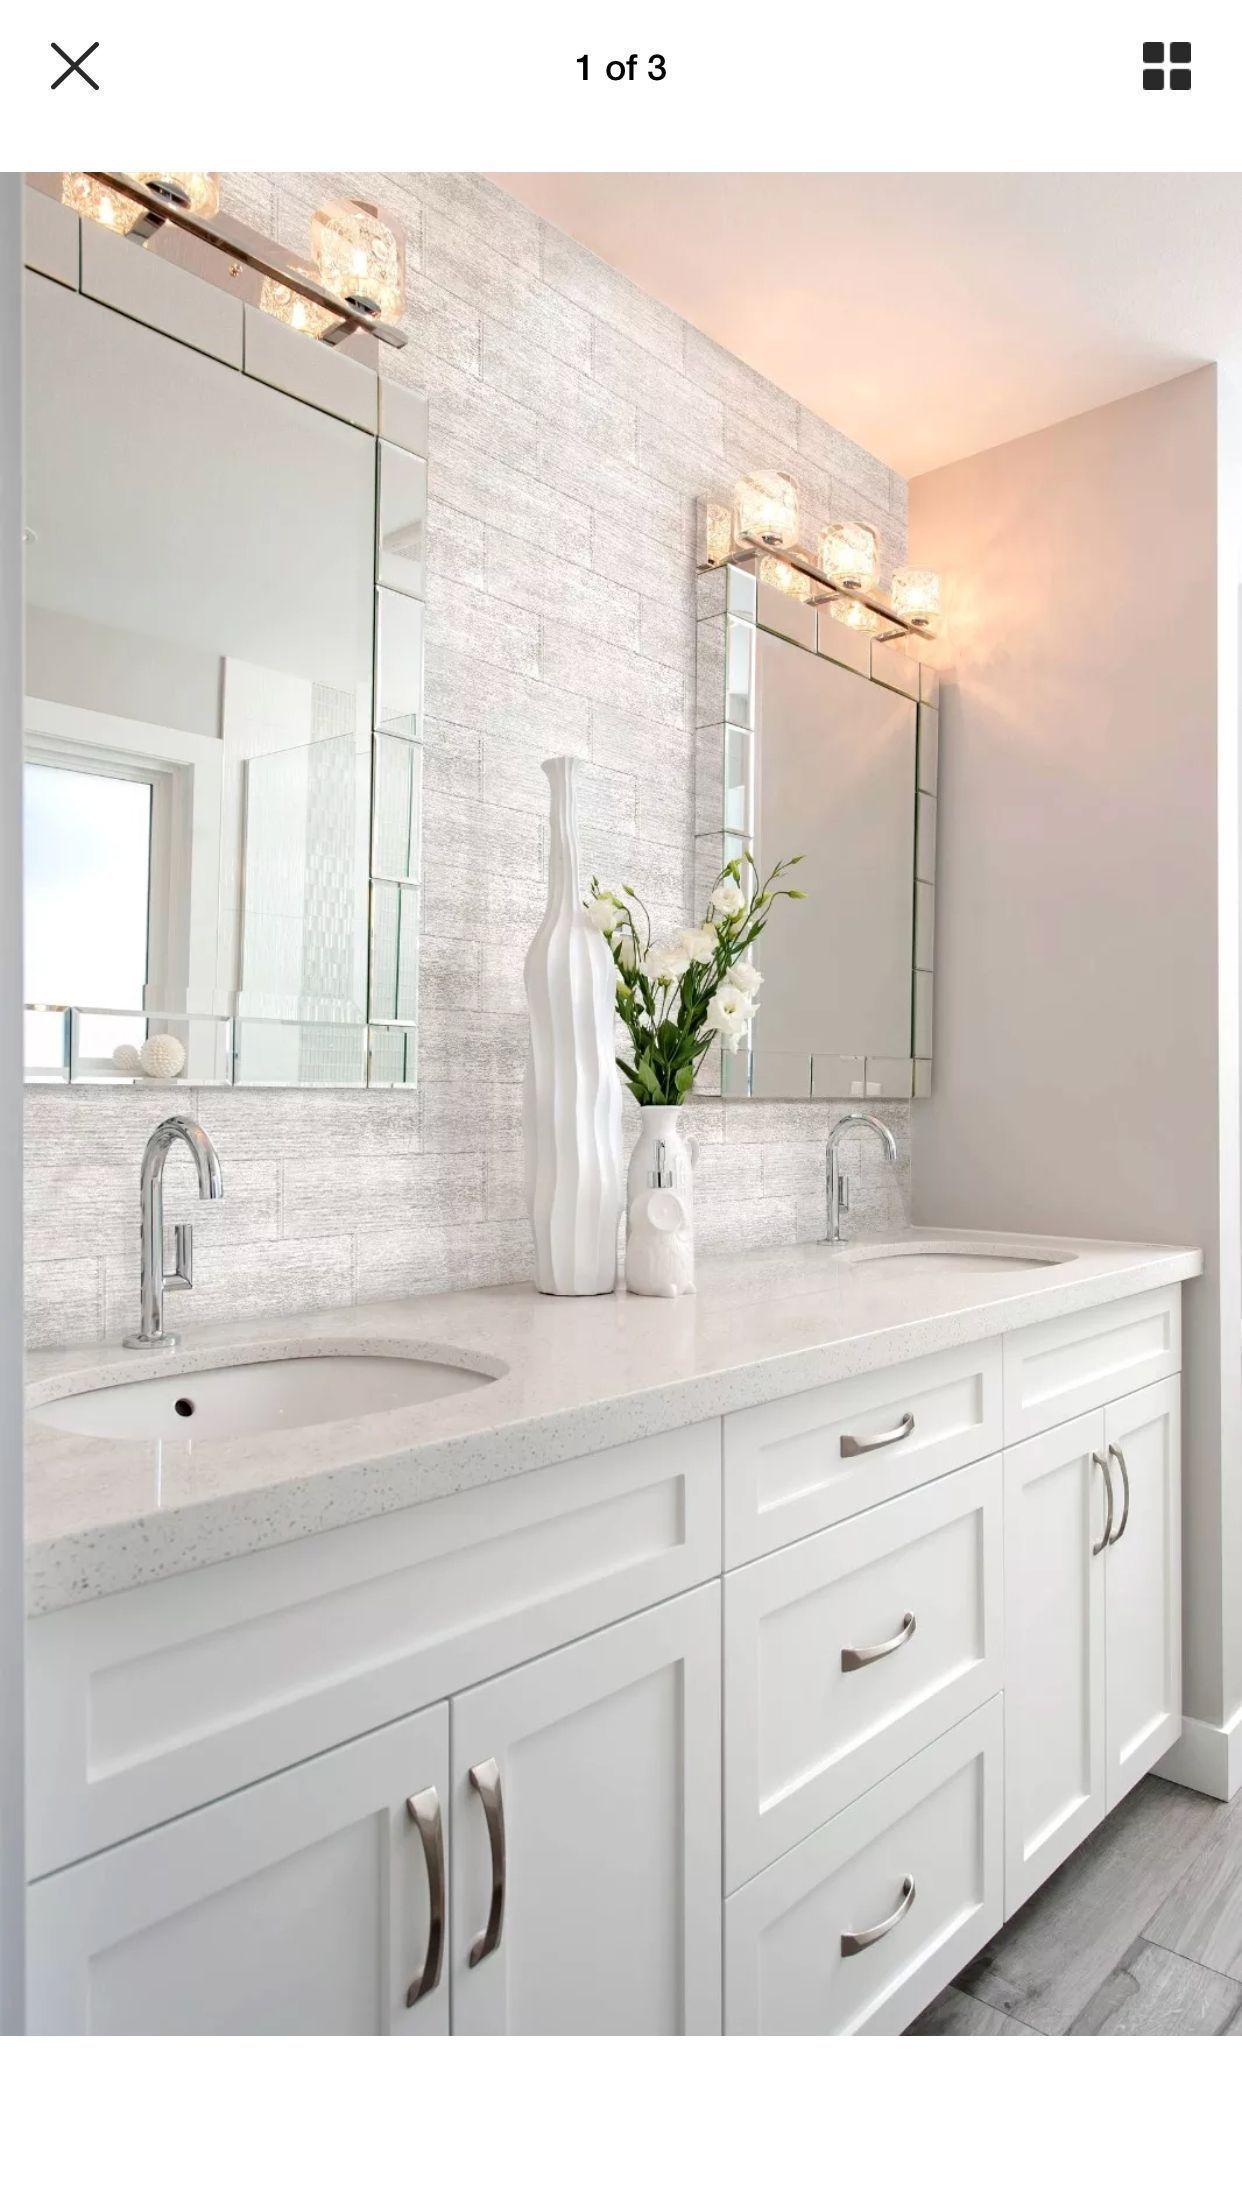 Wonderful Bathroom Vanity Mirror Design Ideas 19 In 2020 Double Vanity Bathroom Bathroom Vanity Designs Vanity Design